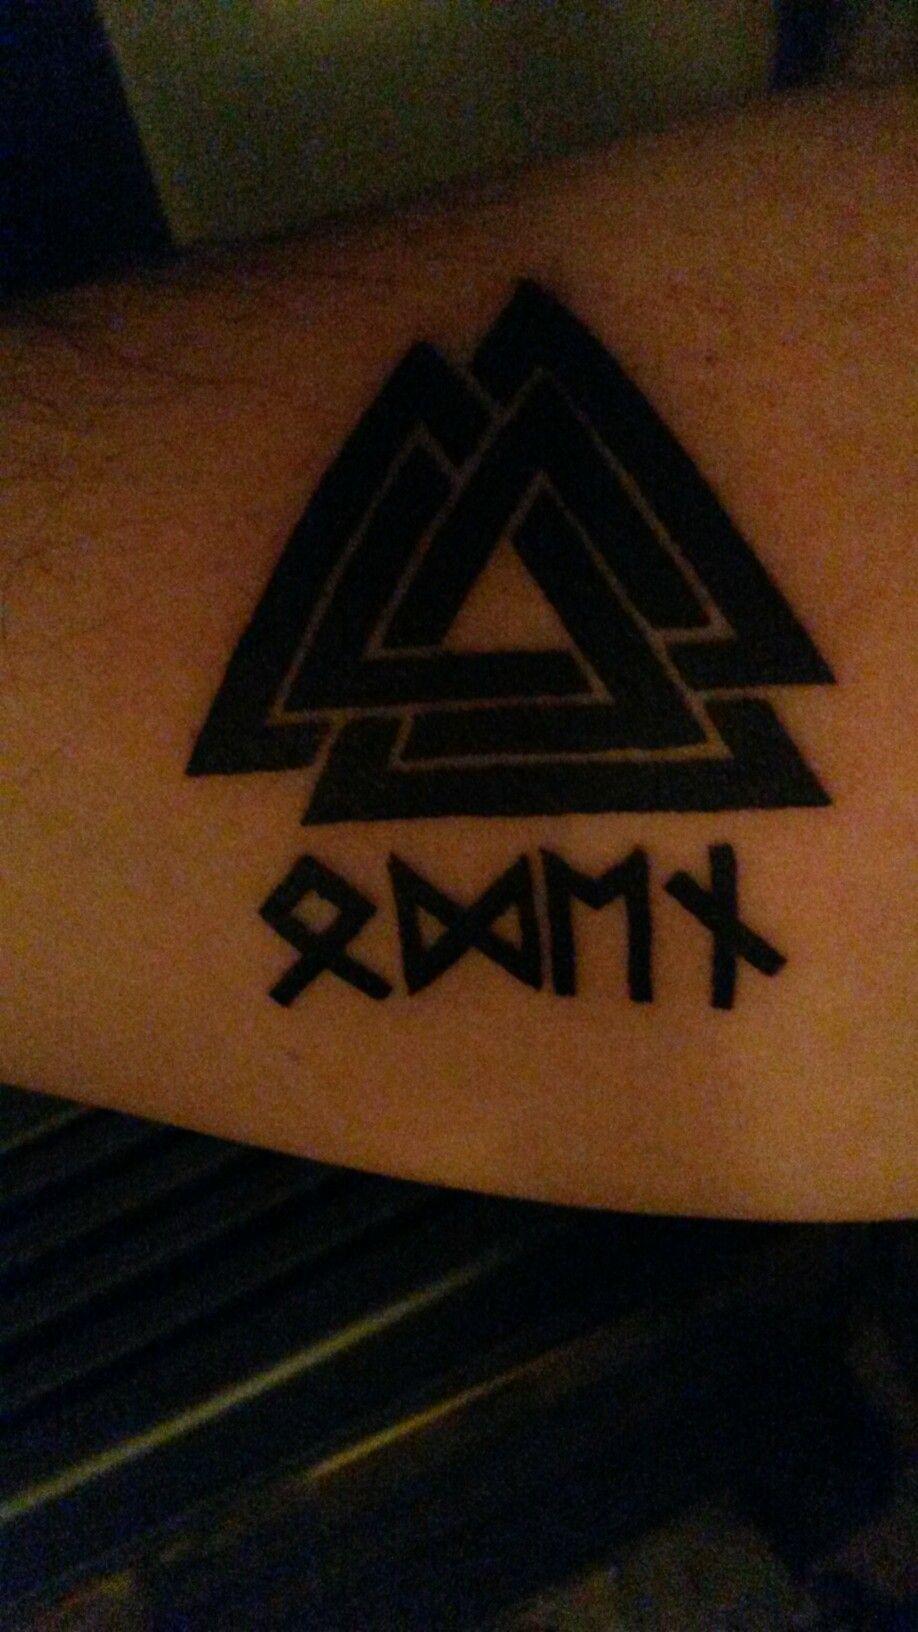 Viking valknut runes odin tattoo poetry for Valknut symbol tattoo